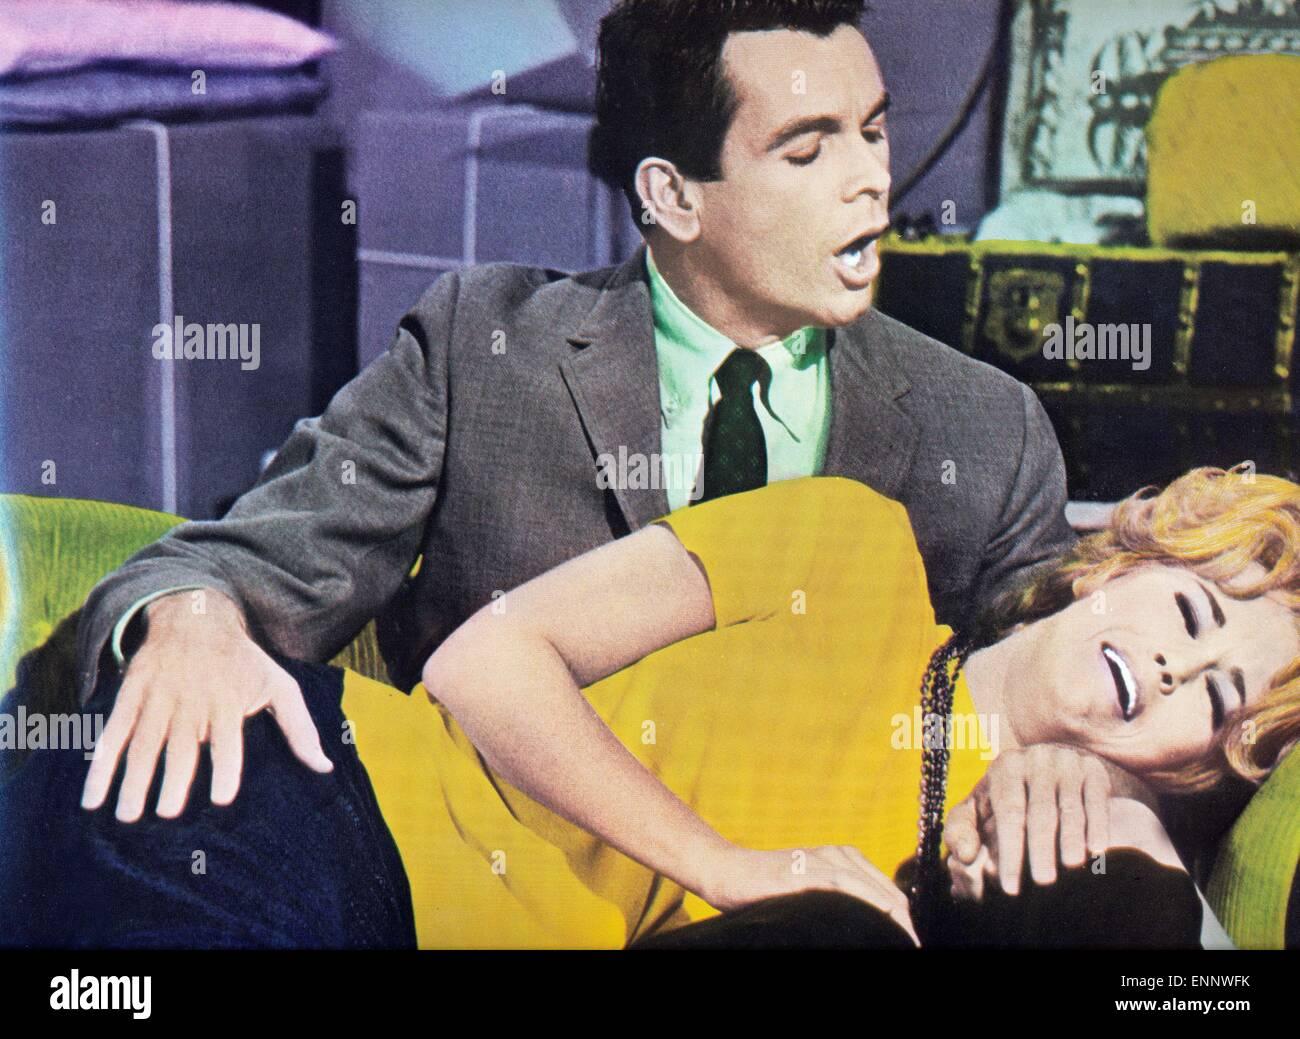 Any Wednesday, USA 1966, aka: Jeden Mittwoch, Regie: Robert Ellis Miller, Darsteller: Jane Fonda, Dean Jones Stock Photo